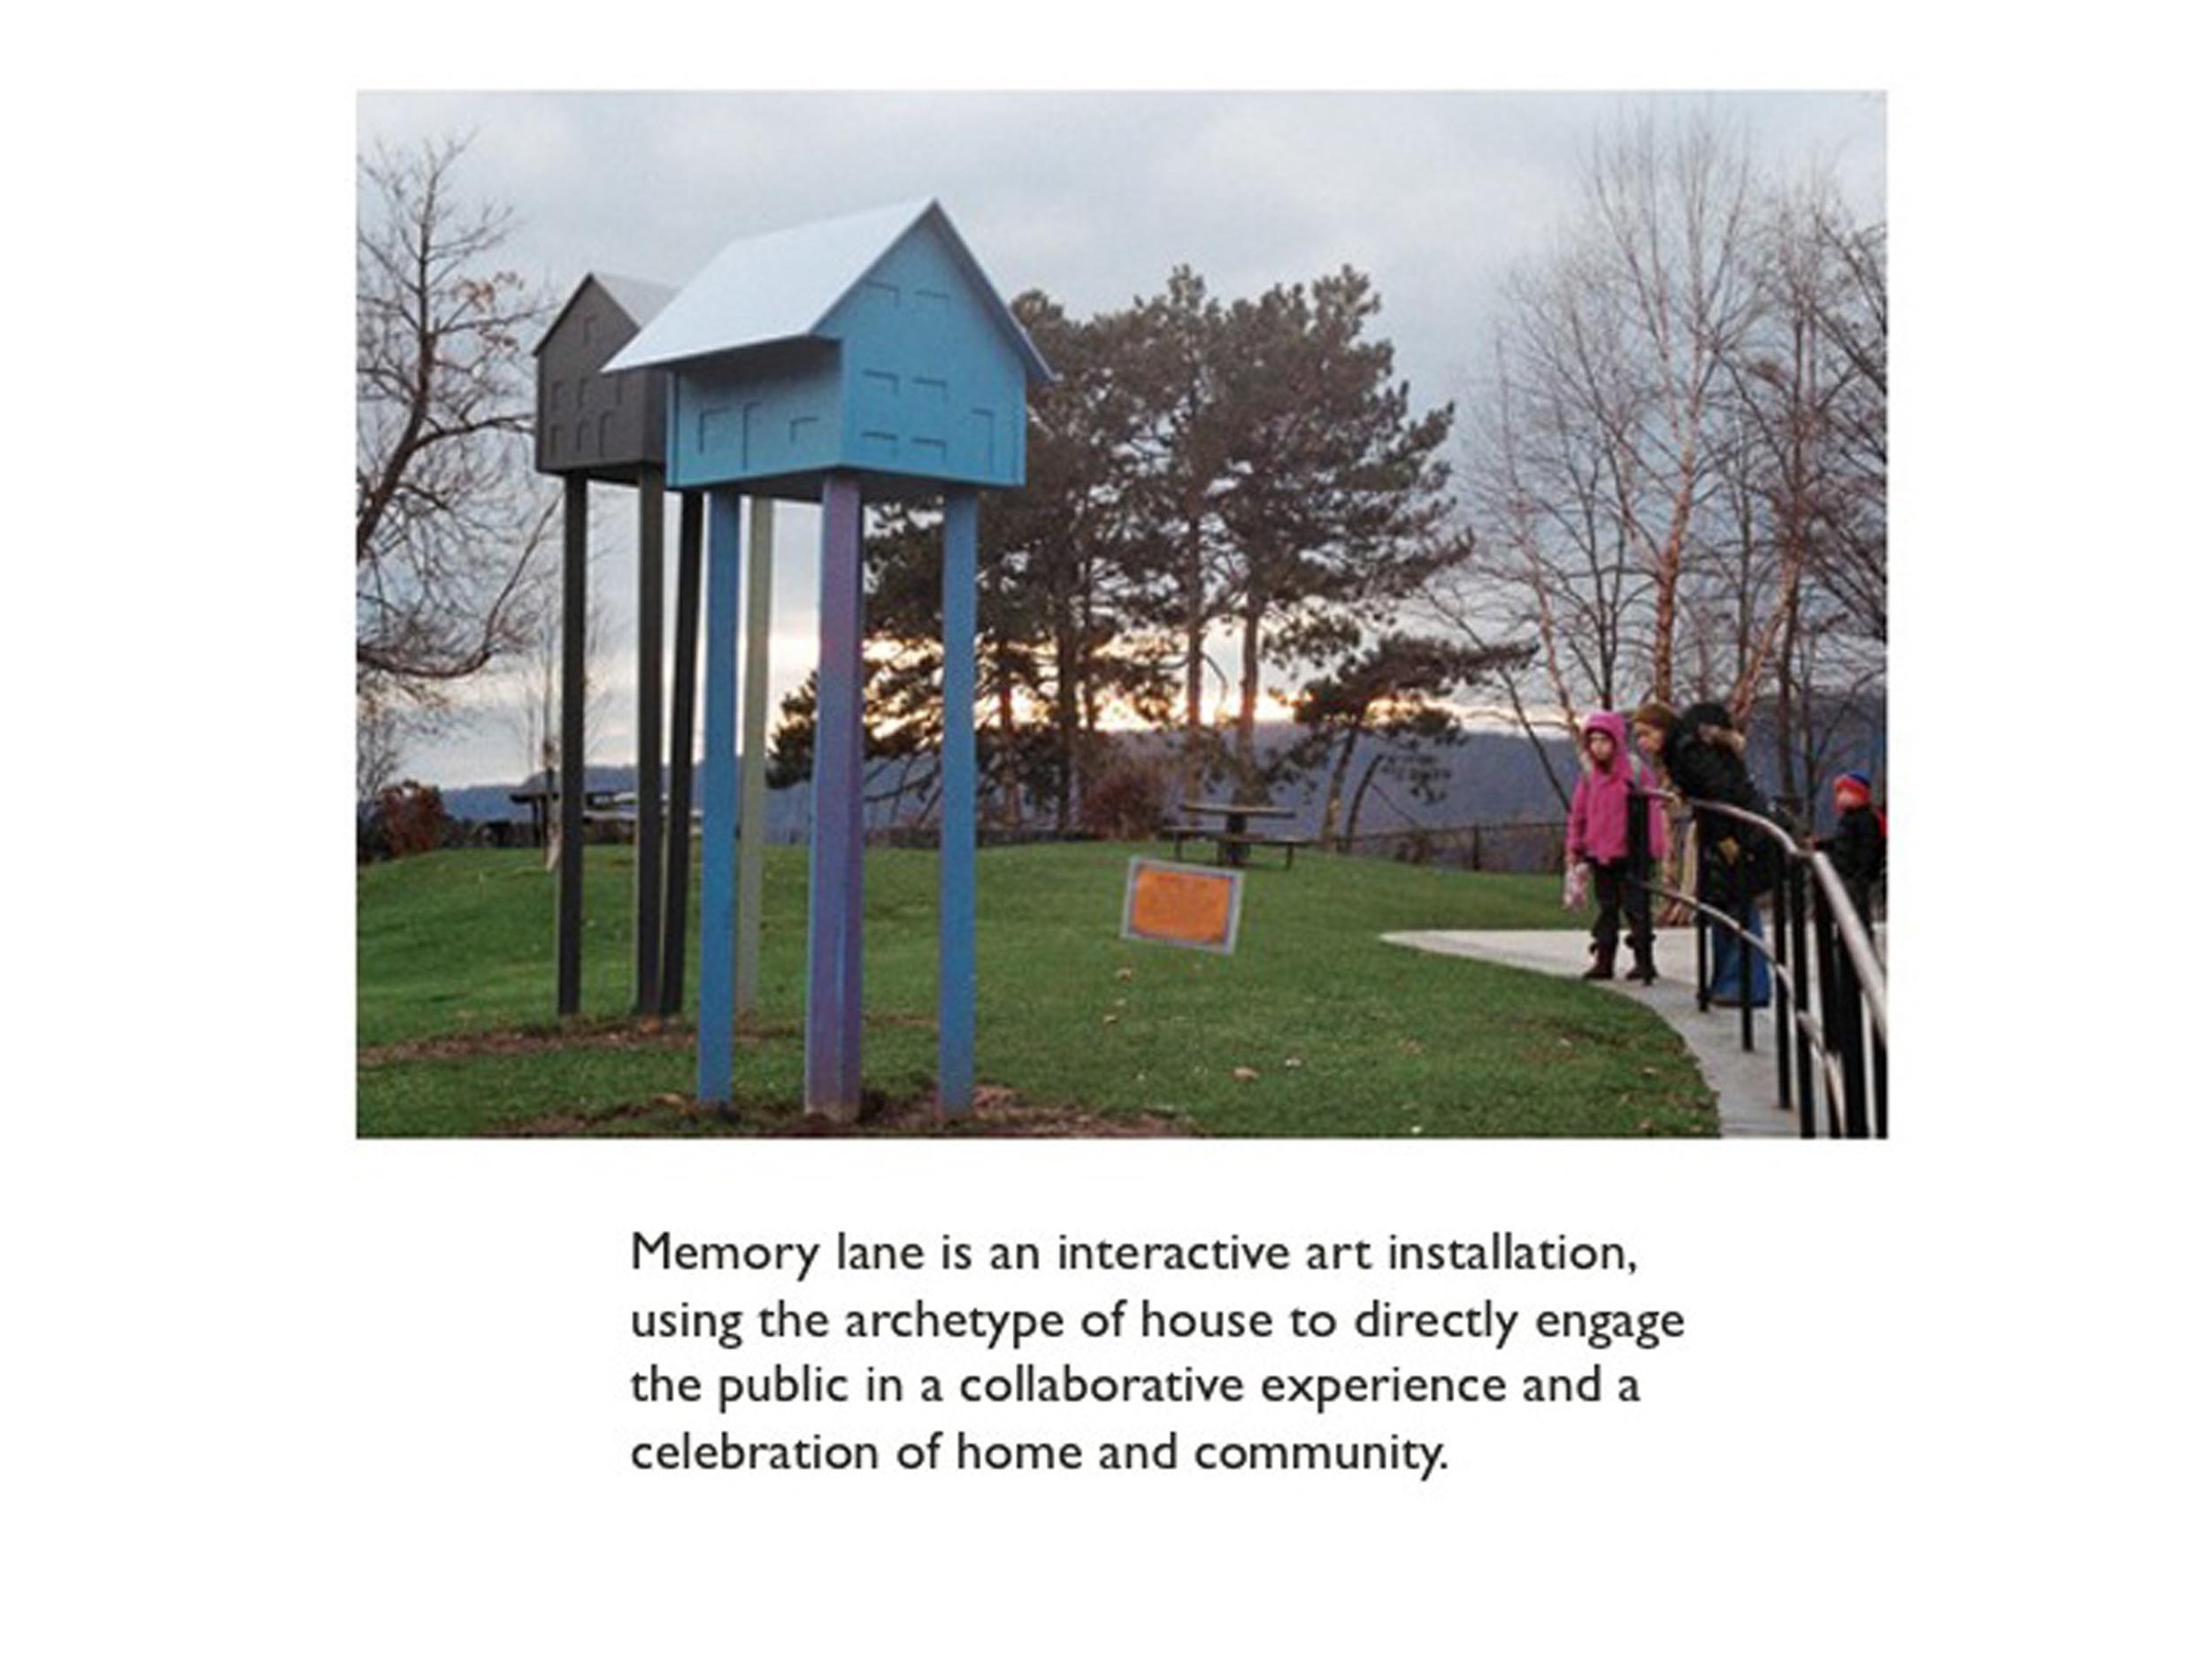 Memory Lane: a public art installation